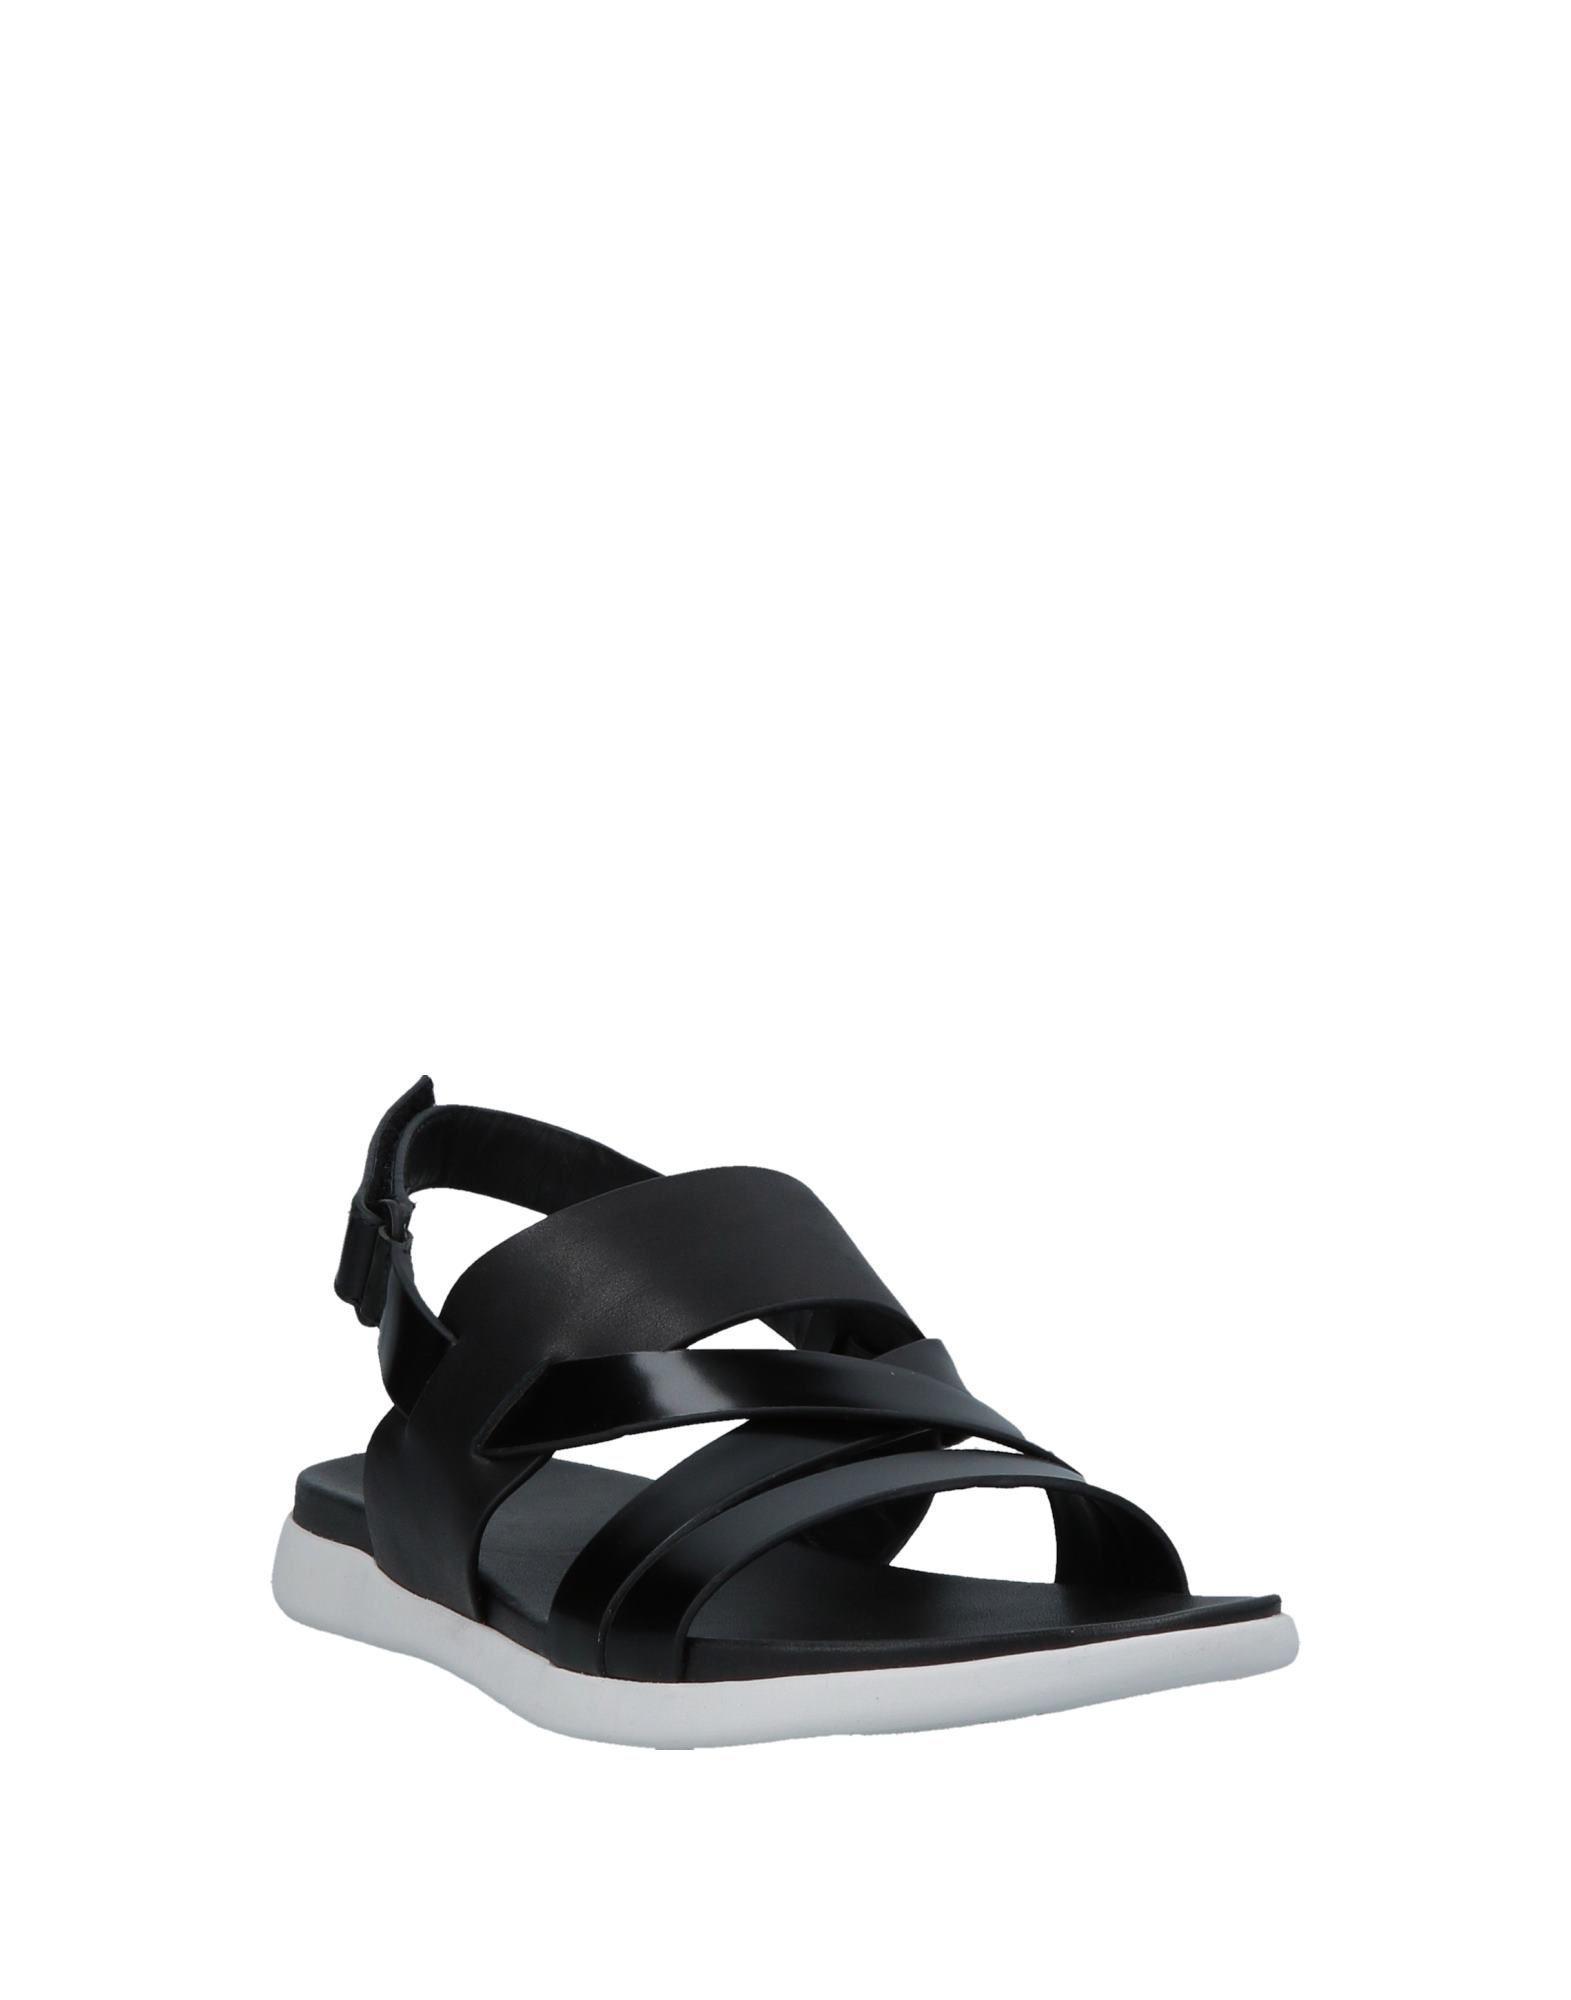 52bd23f7685e3 DKNY - Black Sandals - Lyst. View fullscreen